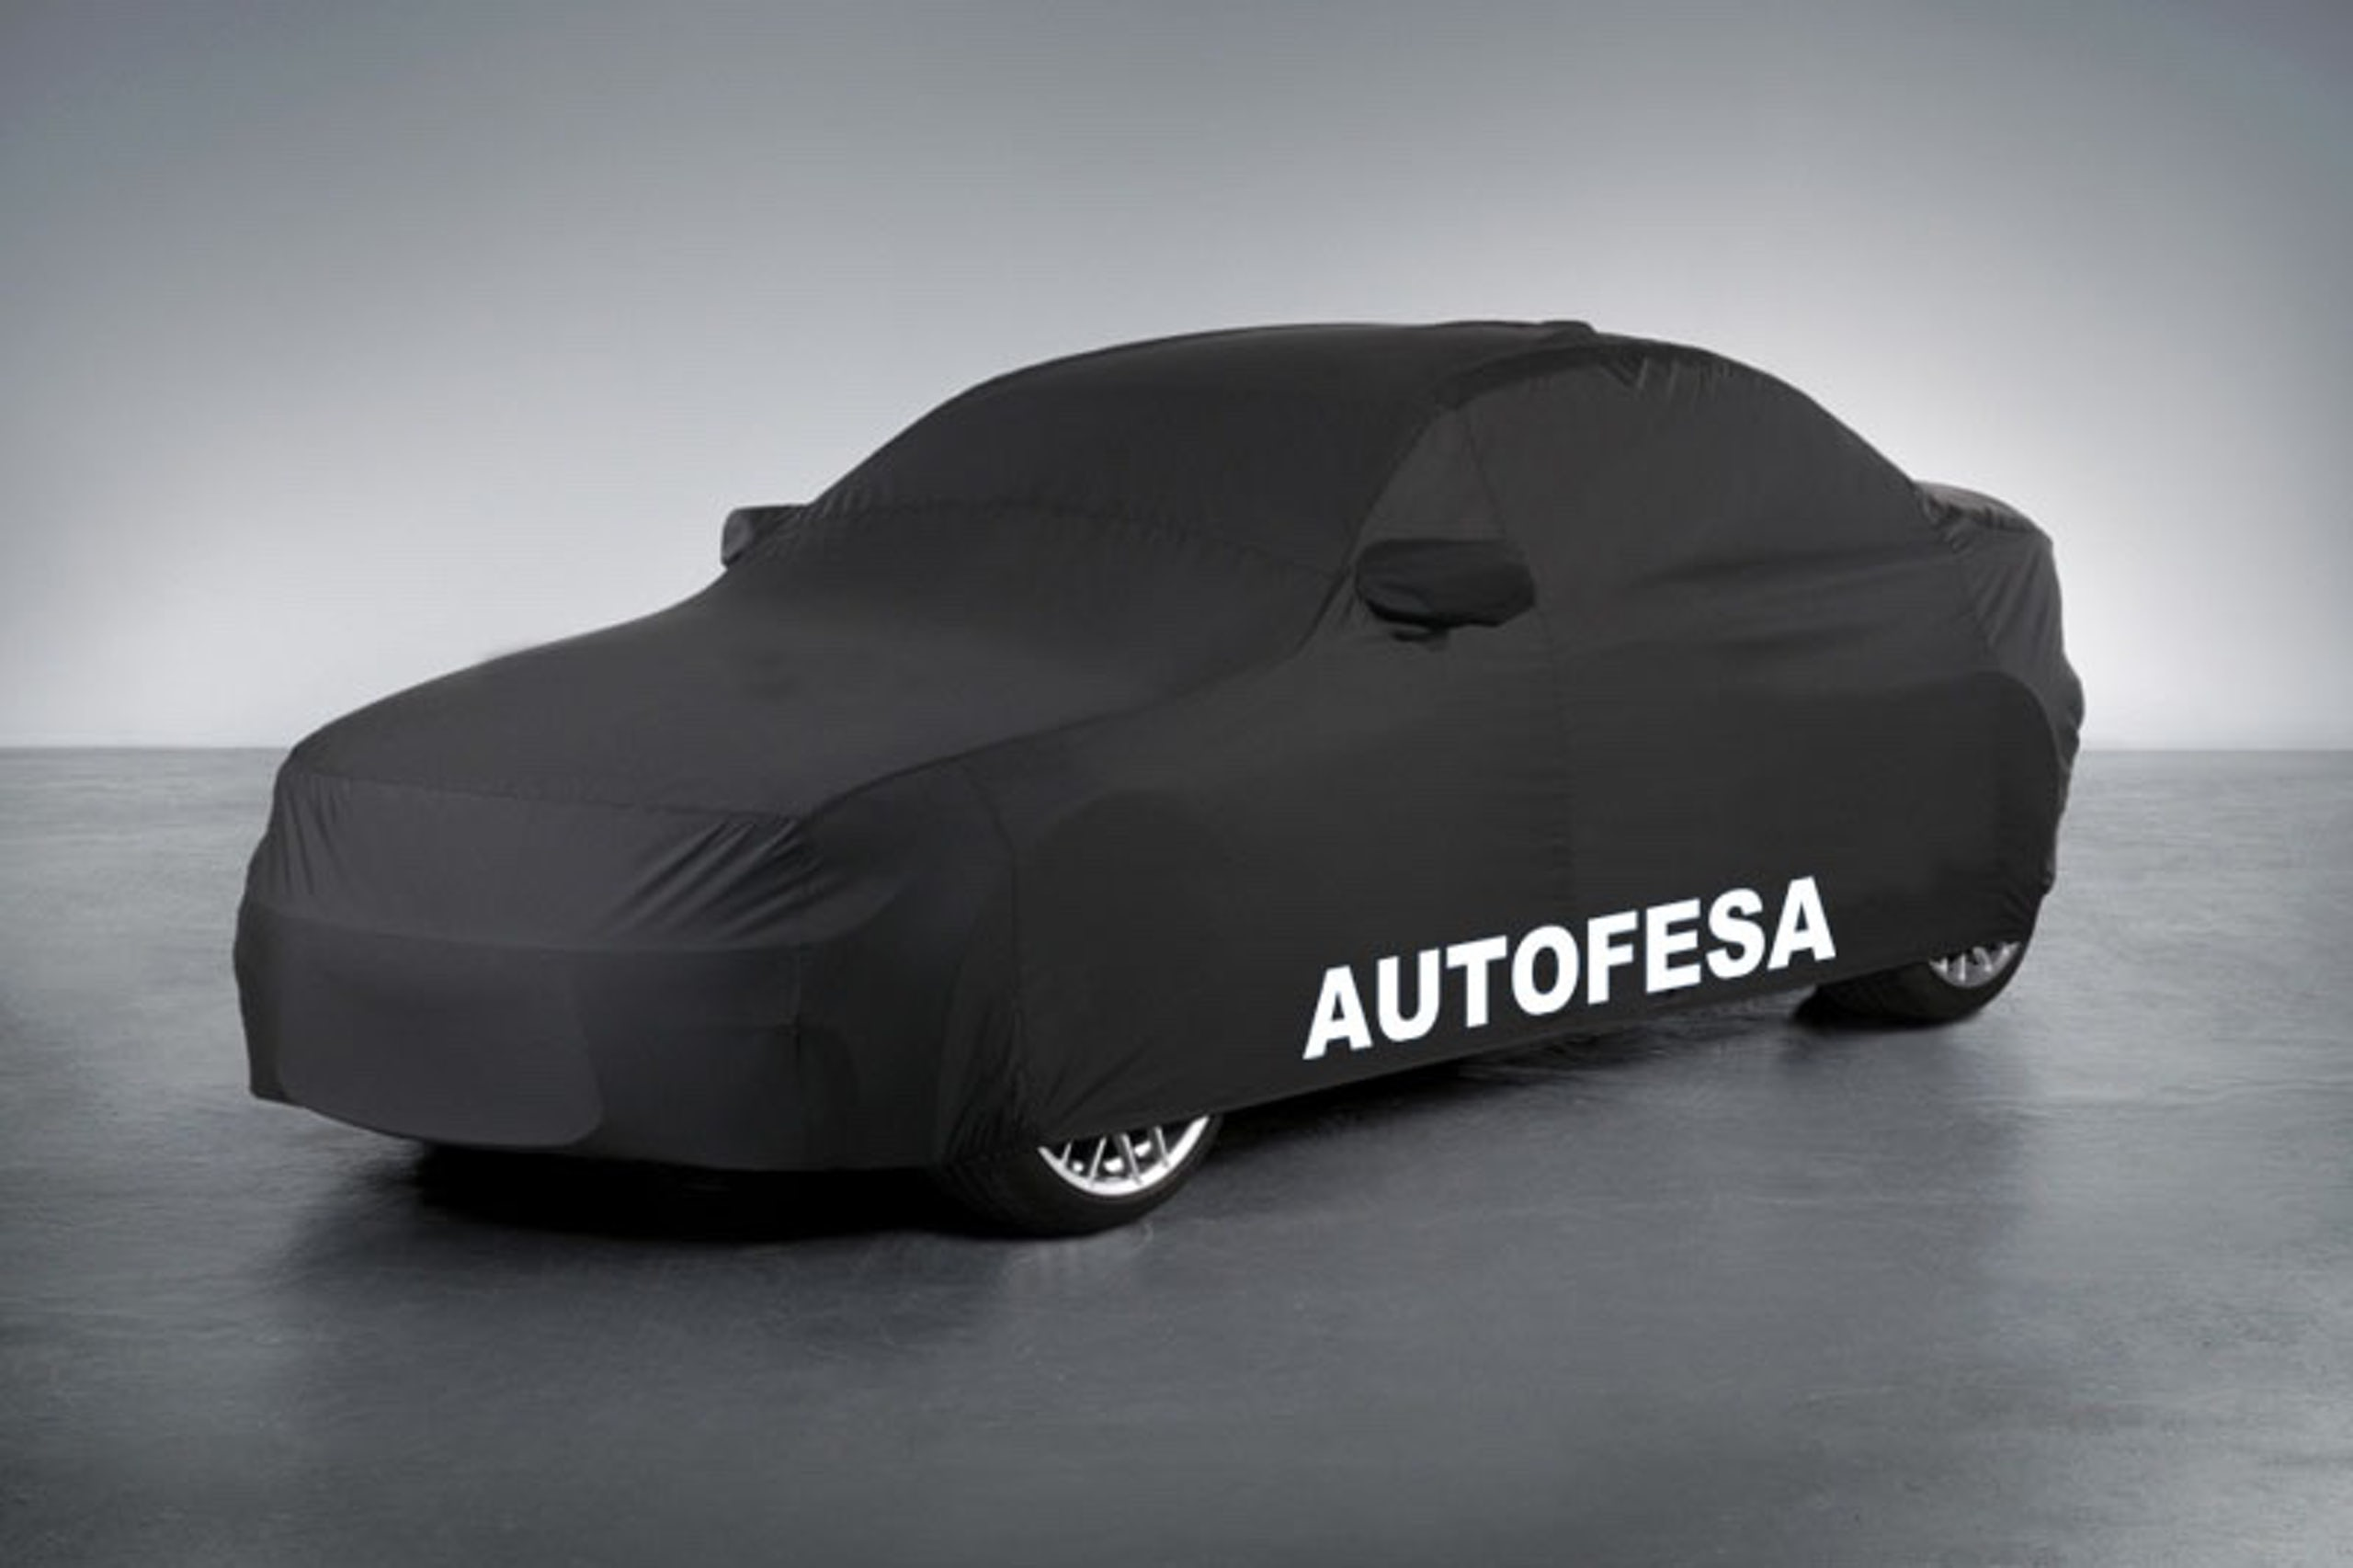 Mitsubishi Outlander 2.0 DI-D 150cv Motion 2WD 5p 7plz Auto S/S - Foto 29